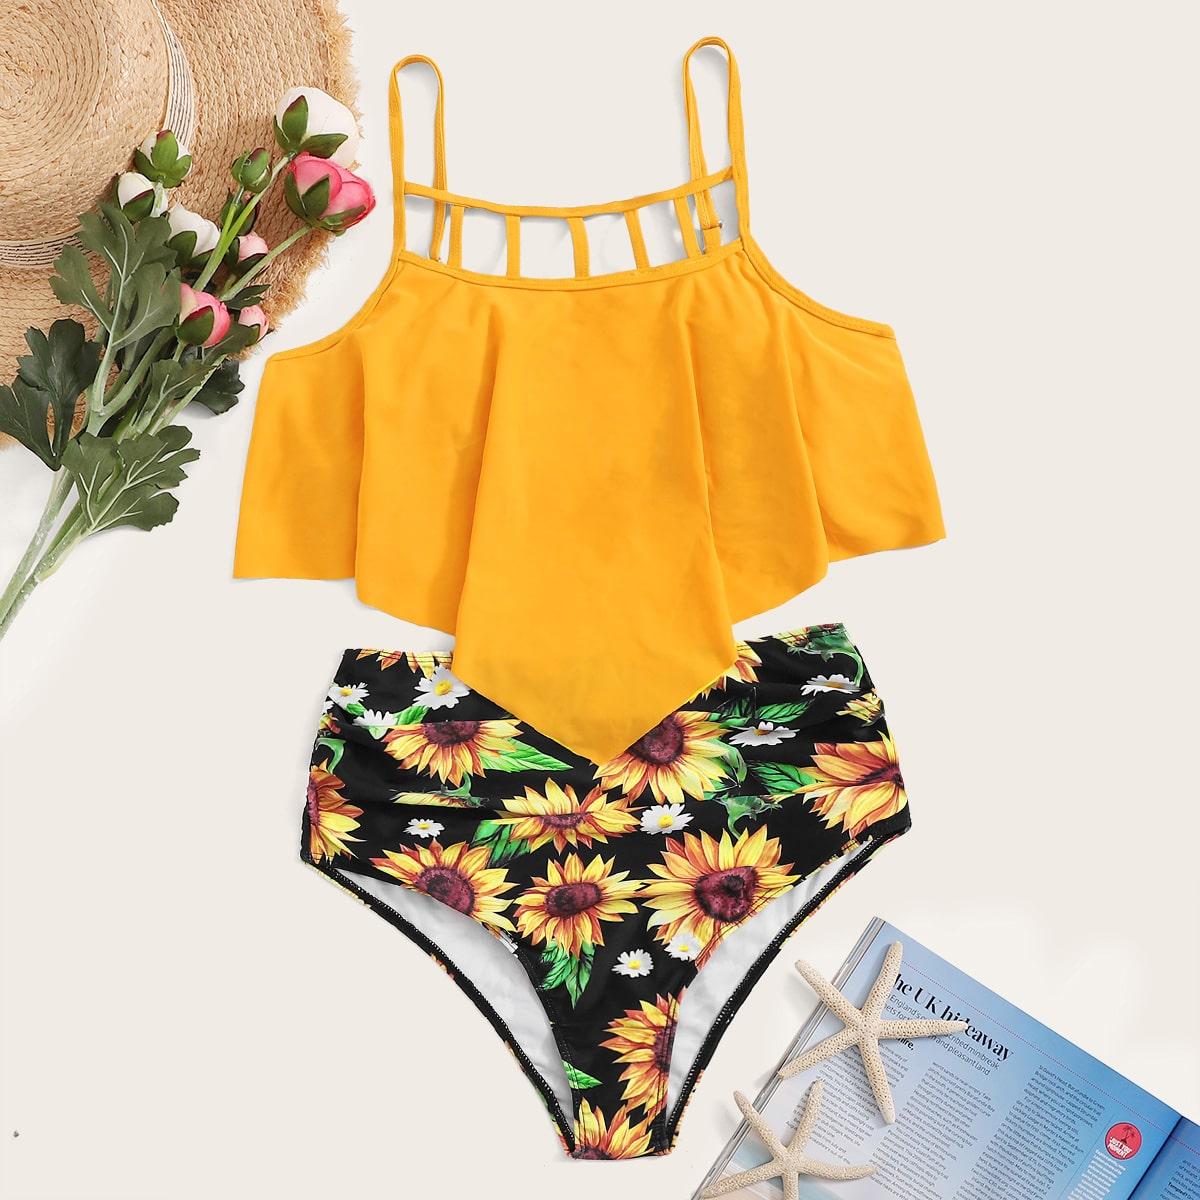 SHEIN coupon: Ladder Cut-out Hanky Hem Bikini Swimsuit